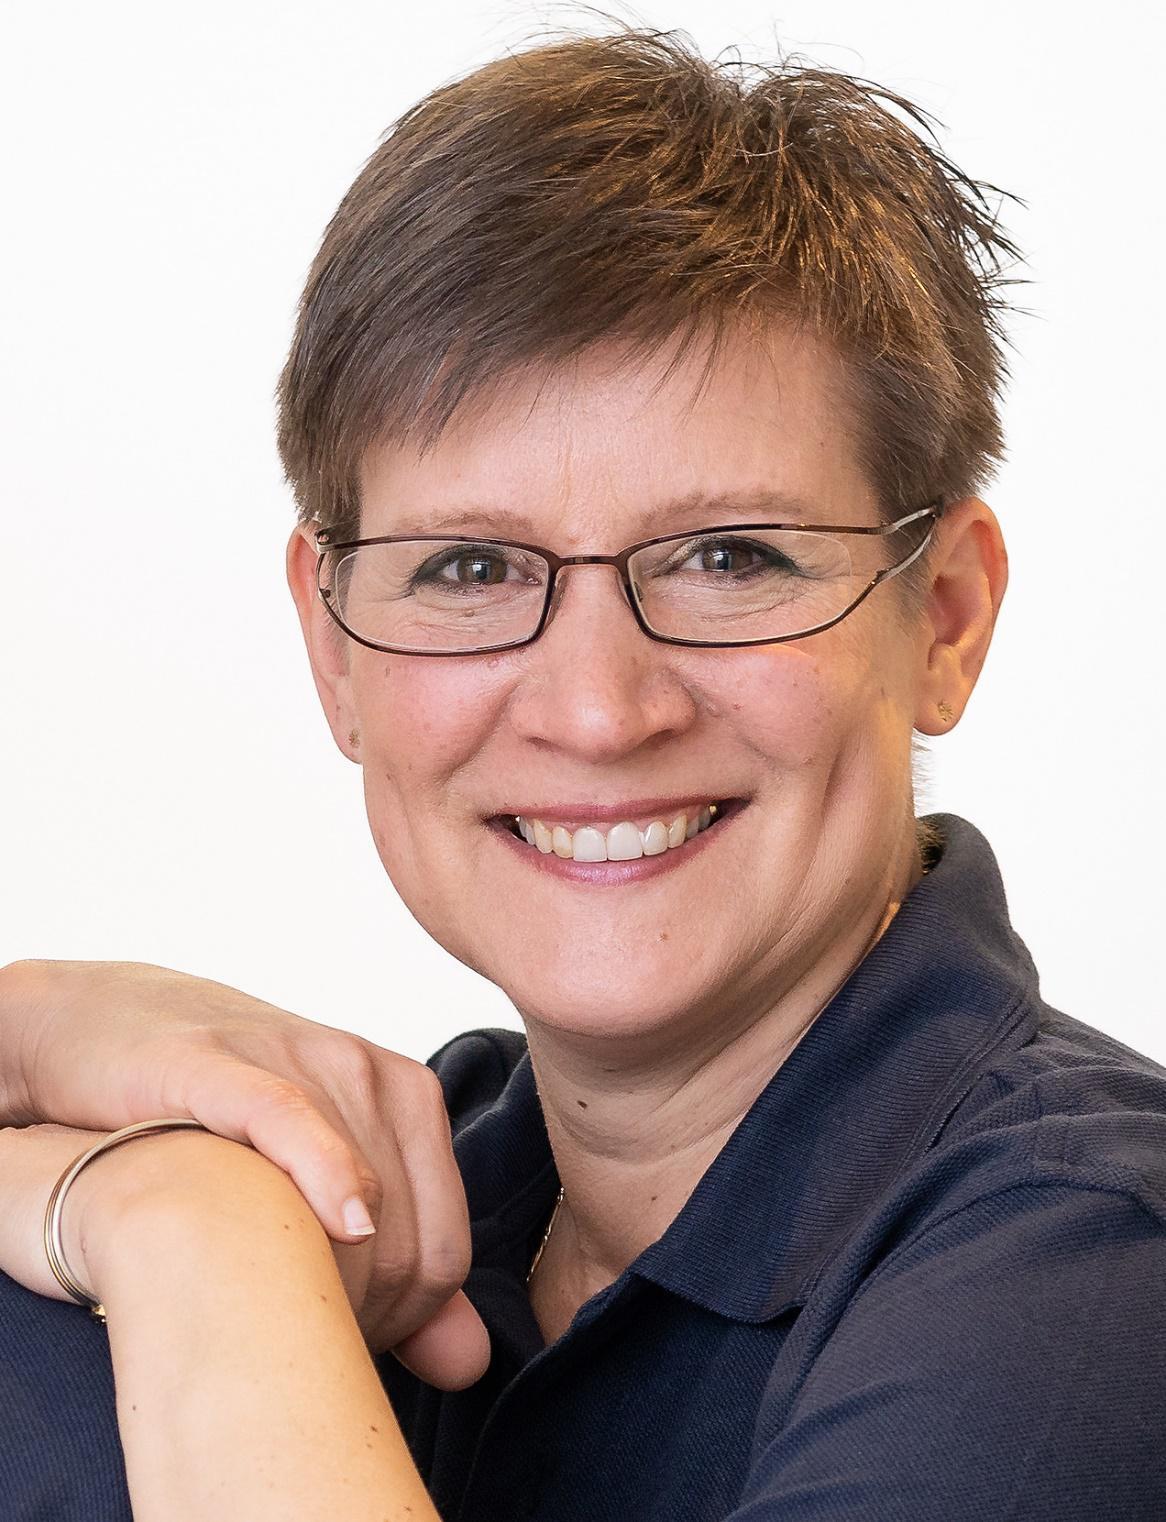 Portraitfoto von Frau Dr. Alexandra Bodmann-Peschke